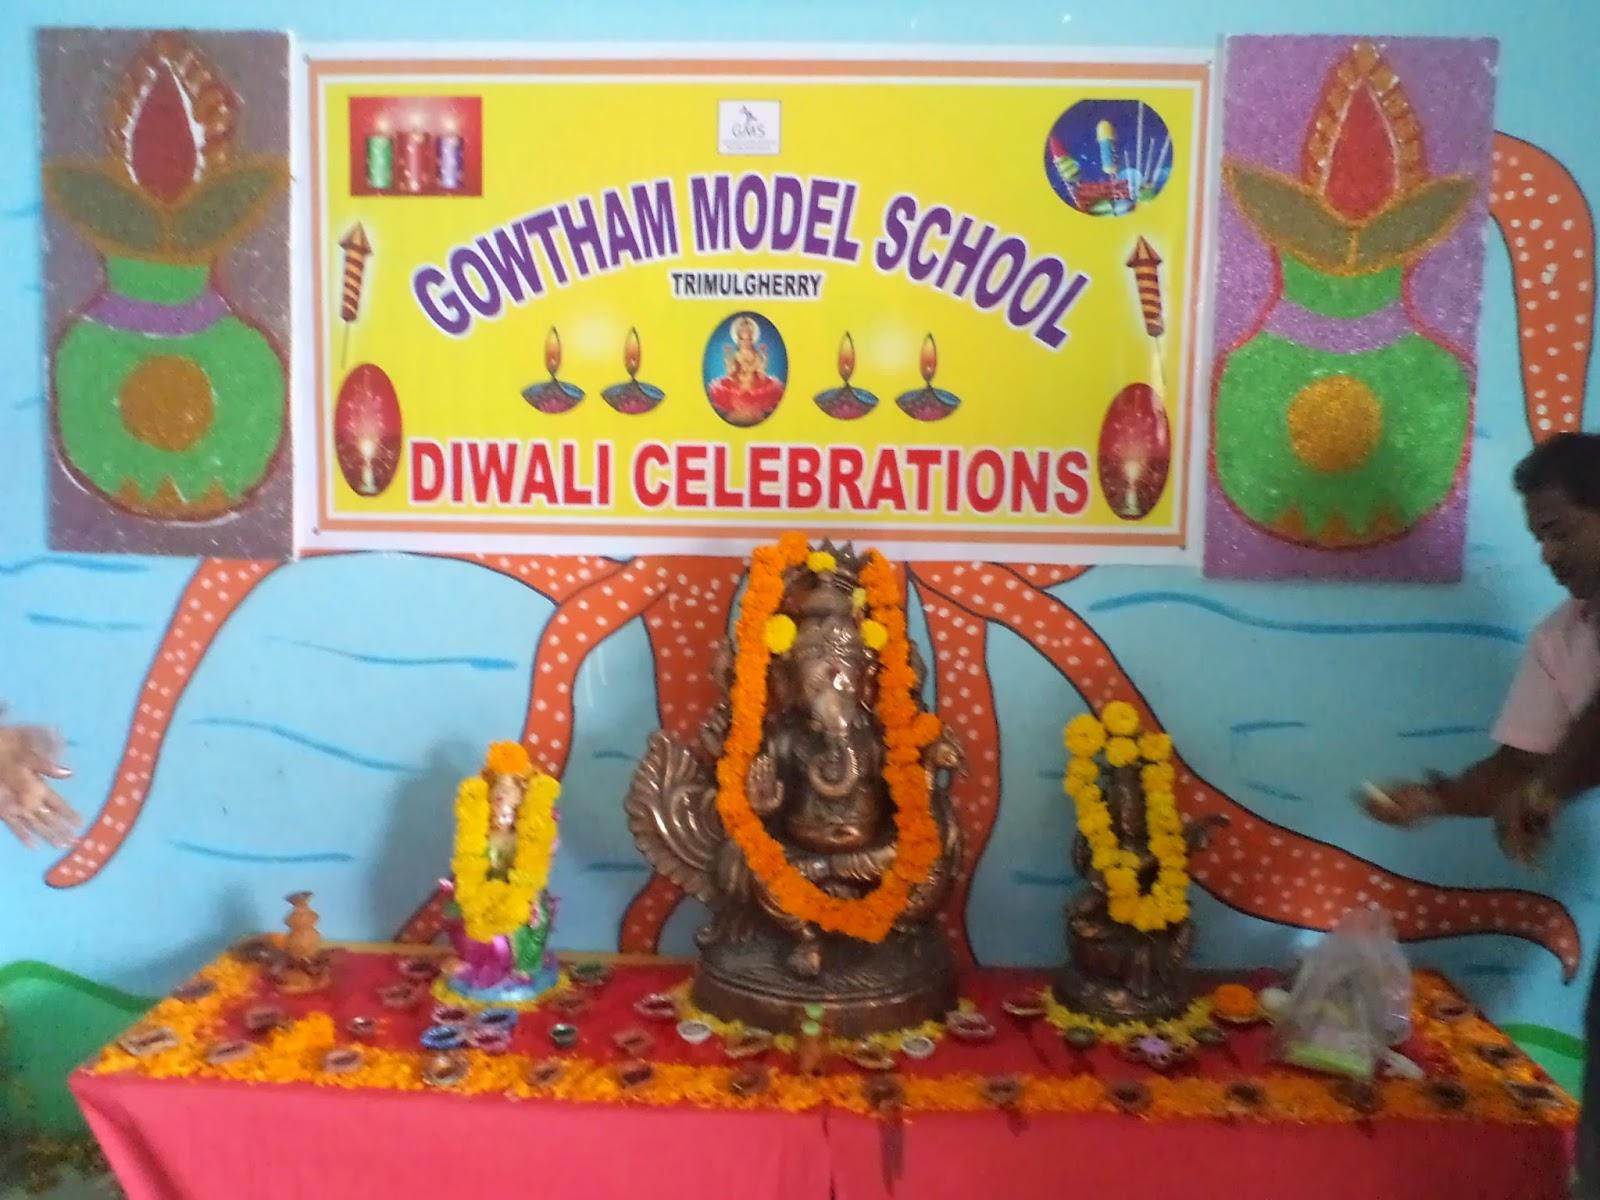 Gowtham Model School Karkhana